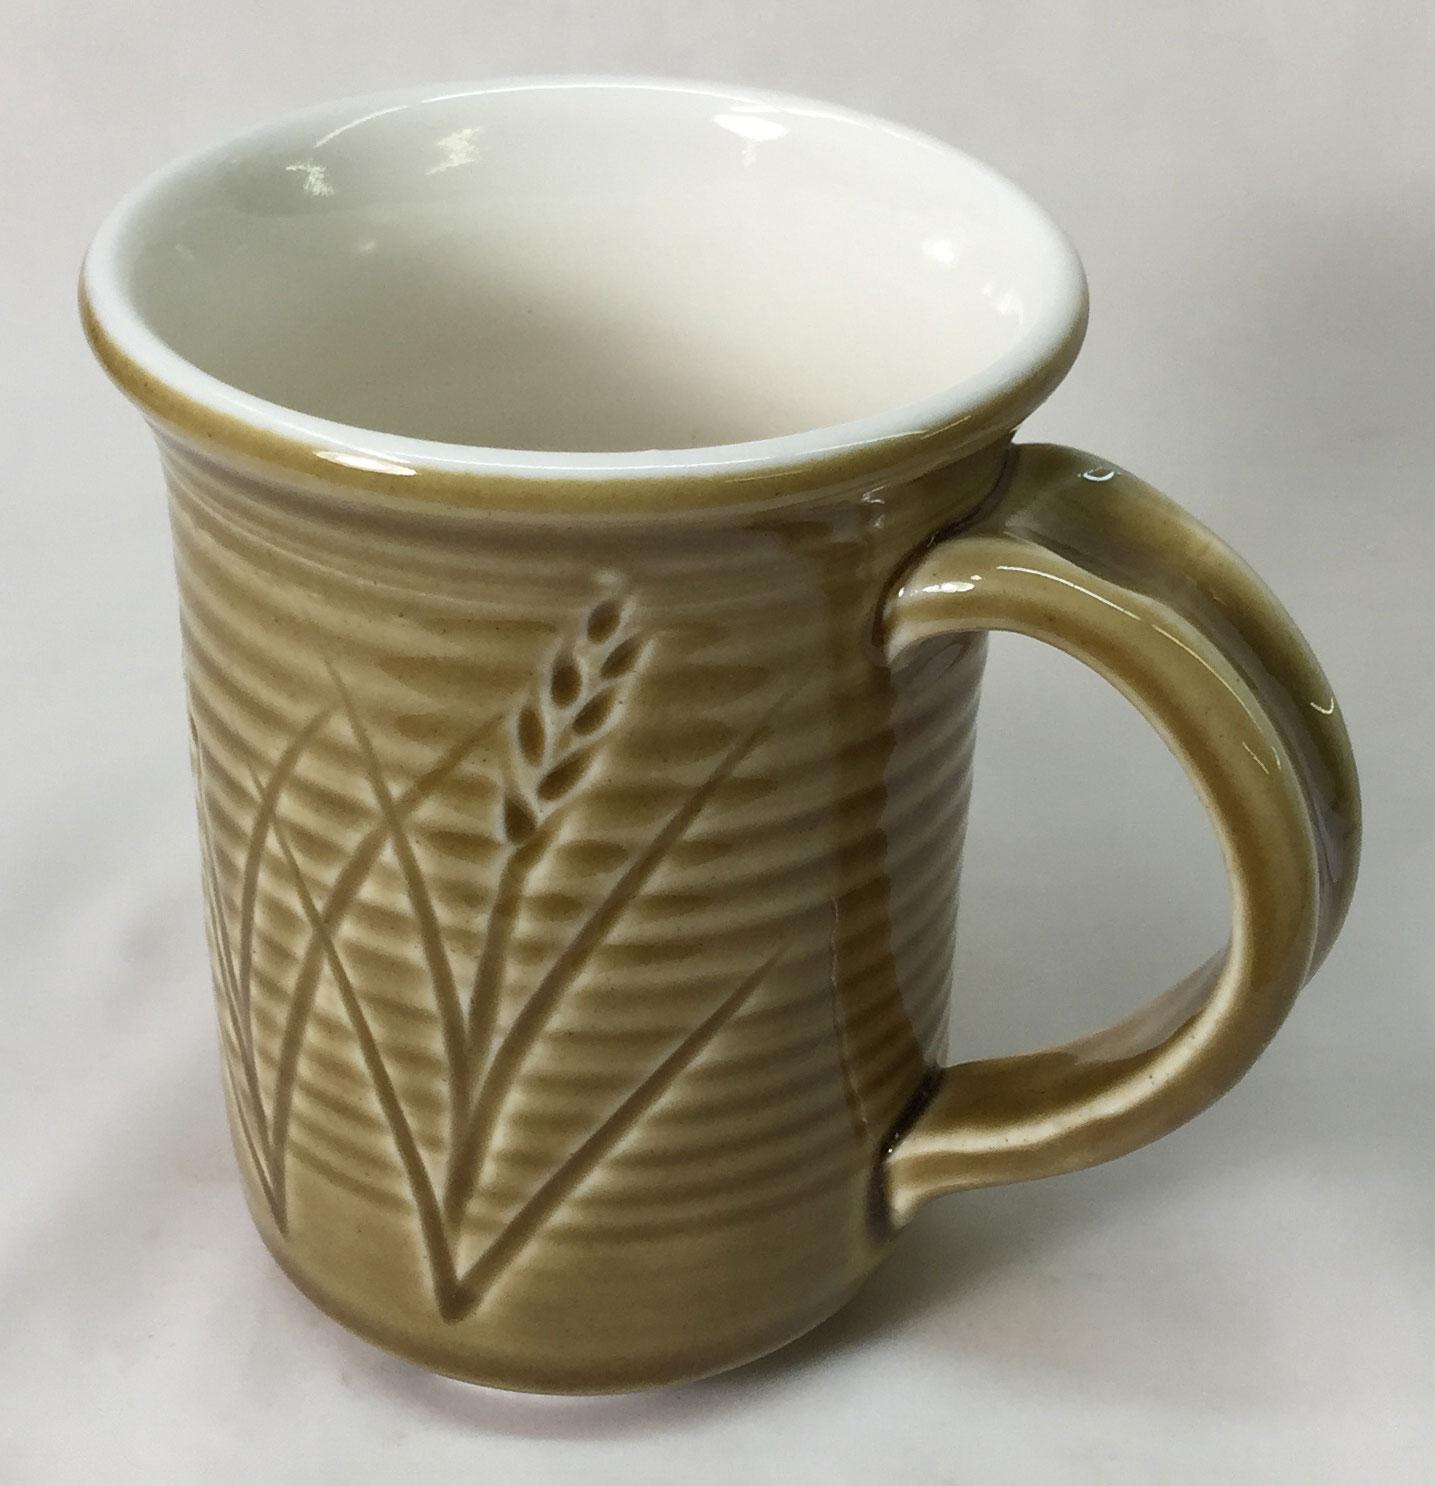 Alberta Slip base amber-clear glaze on the outside of a Polar Ice cone 6 mug